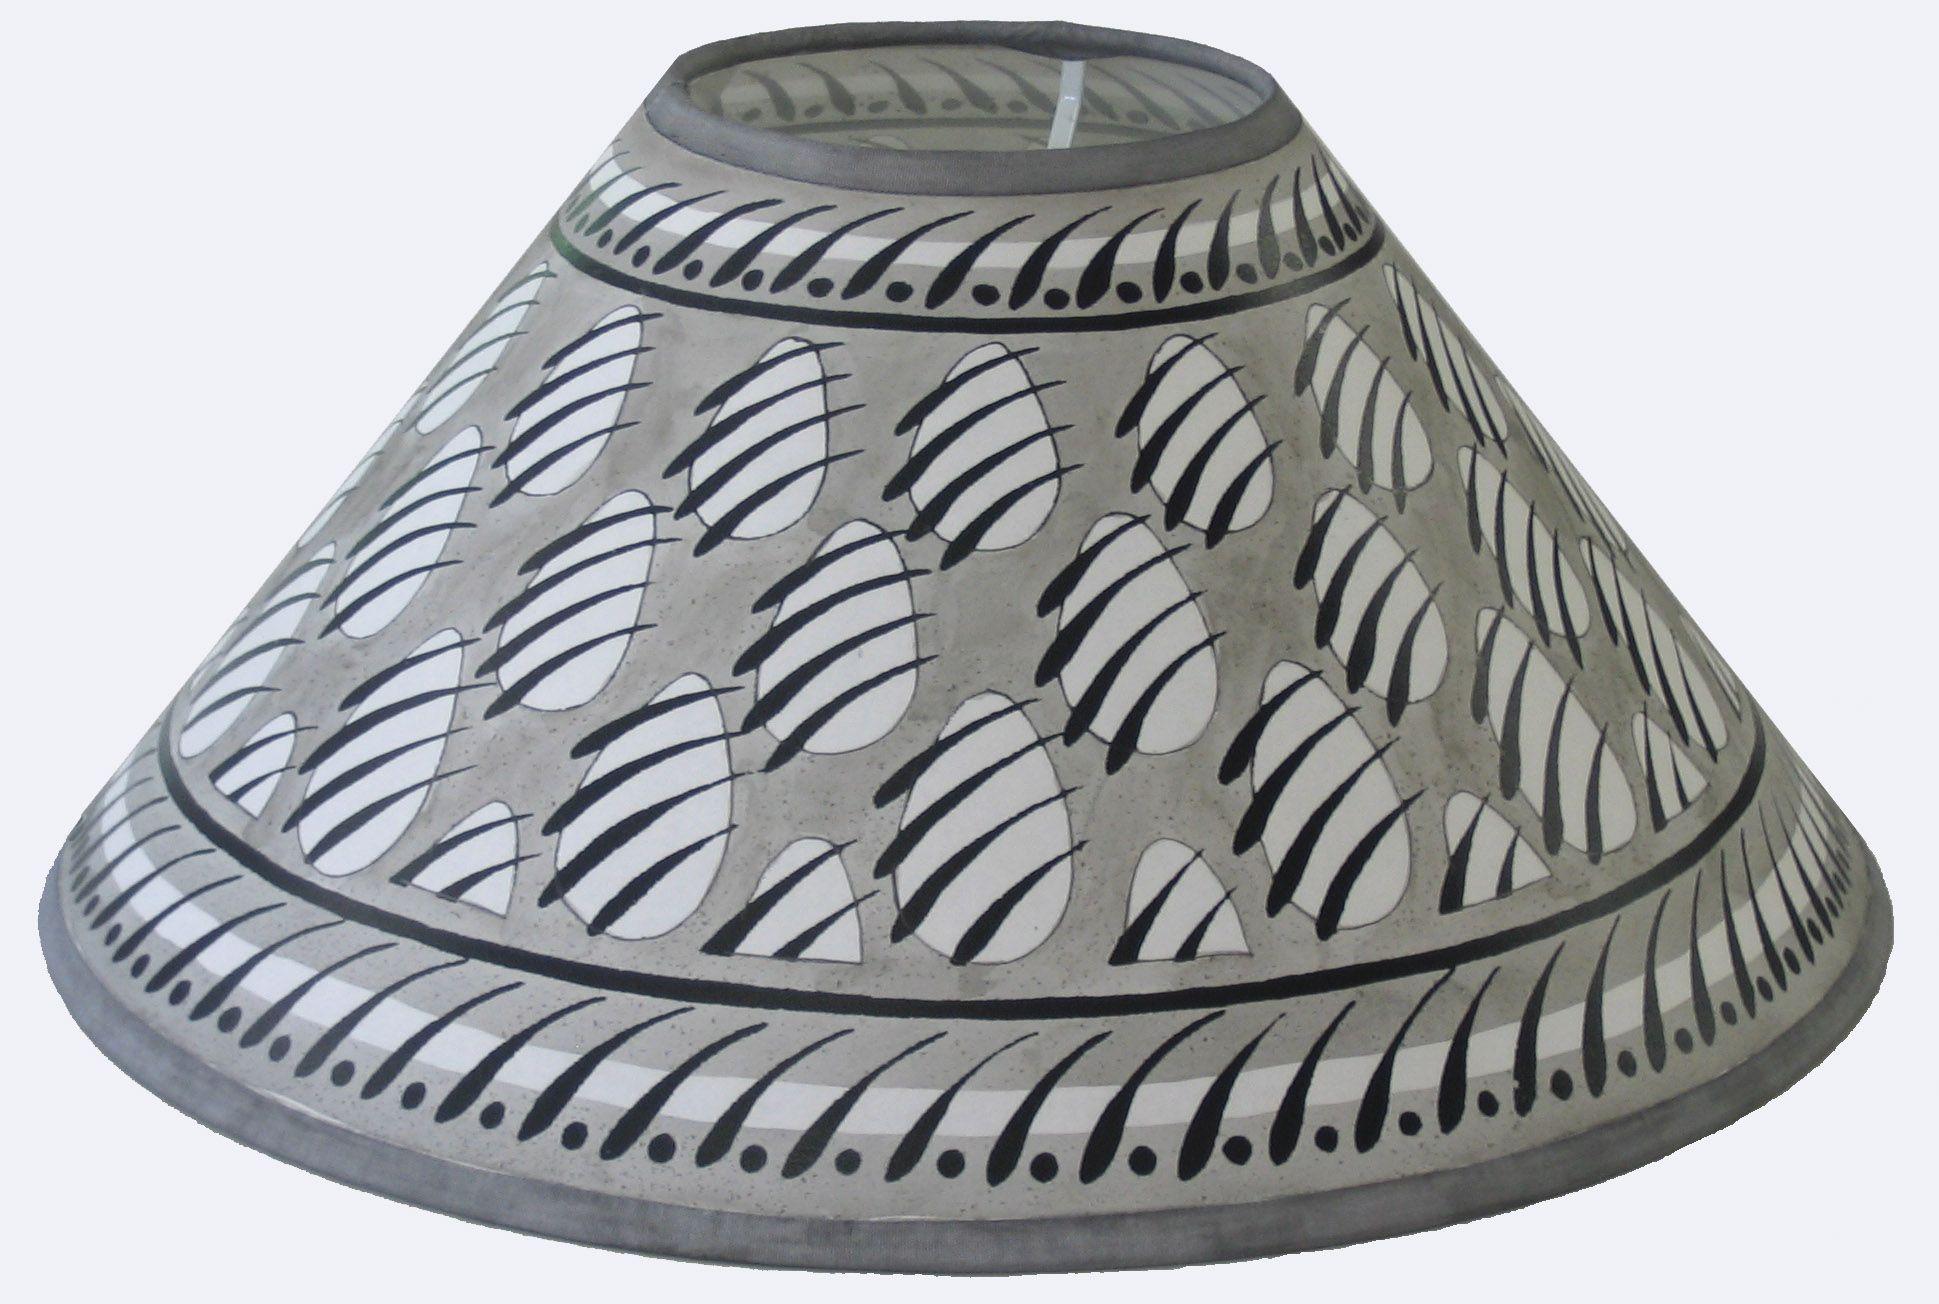 14 36cm Lampshades Grey Paw Print Lampshade Lampshades Lamp Shades Painting Lamp Shades